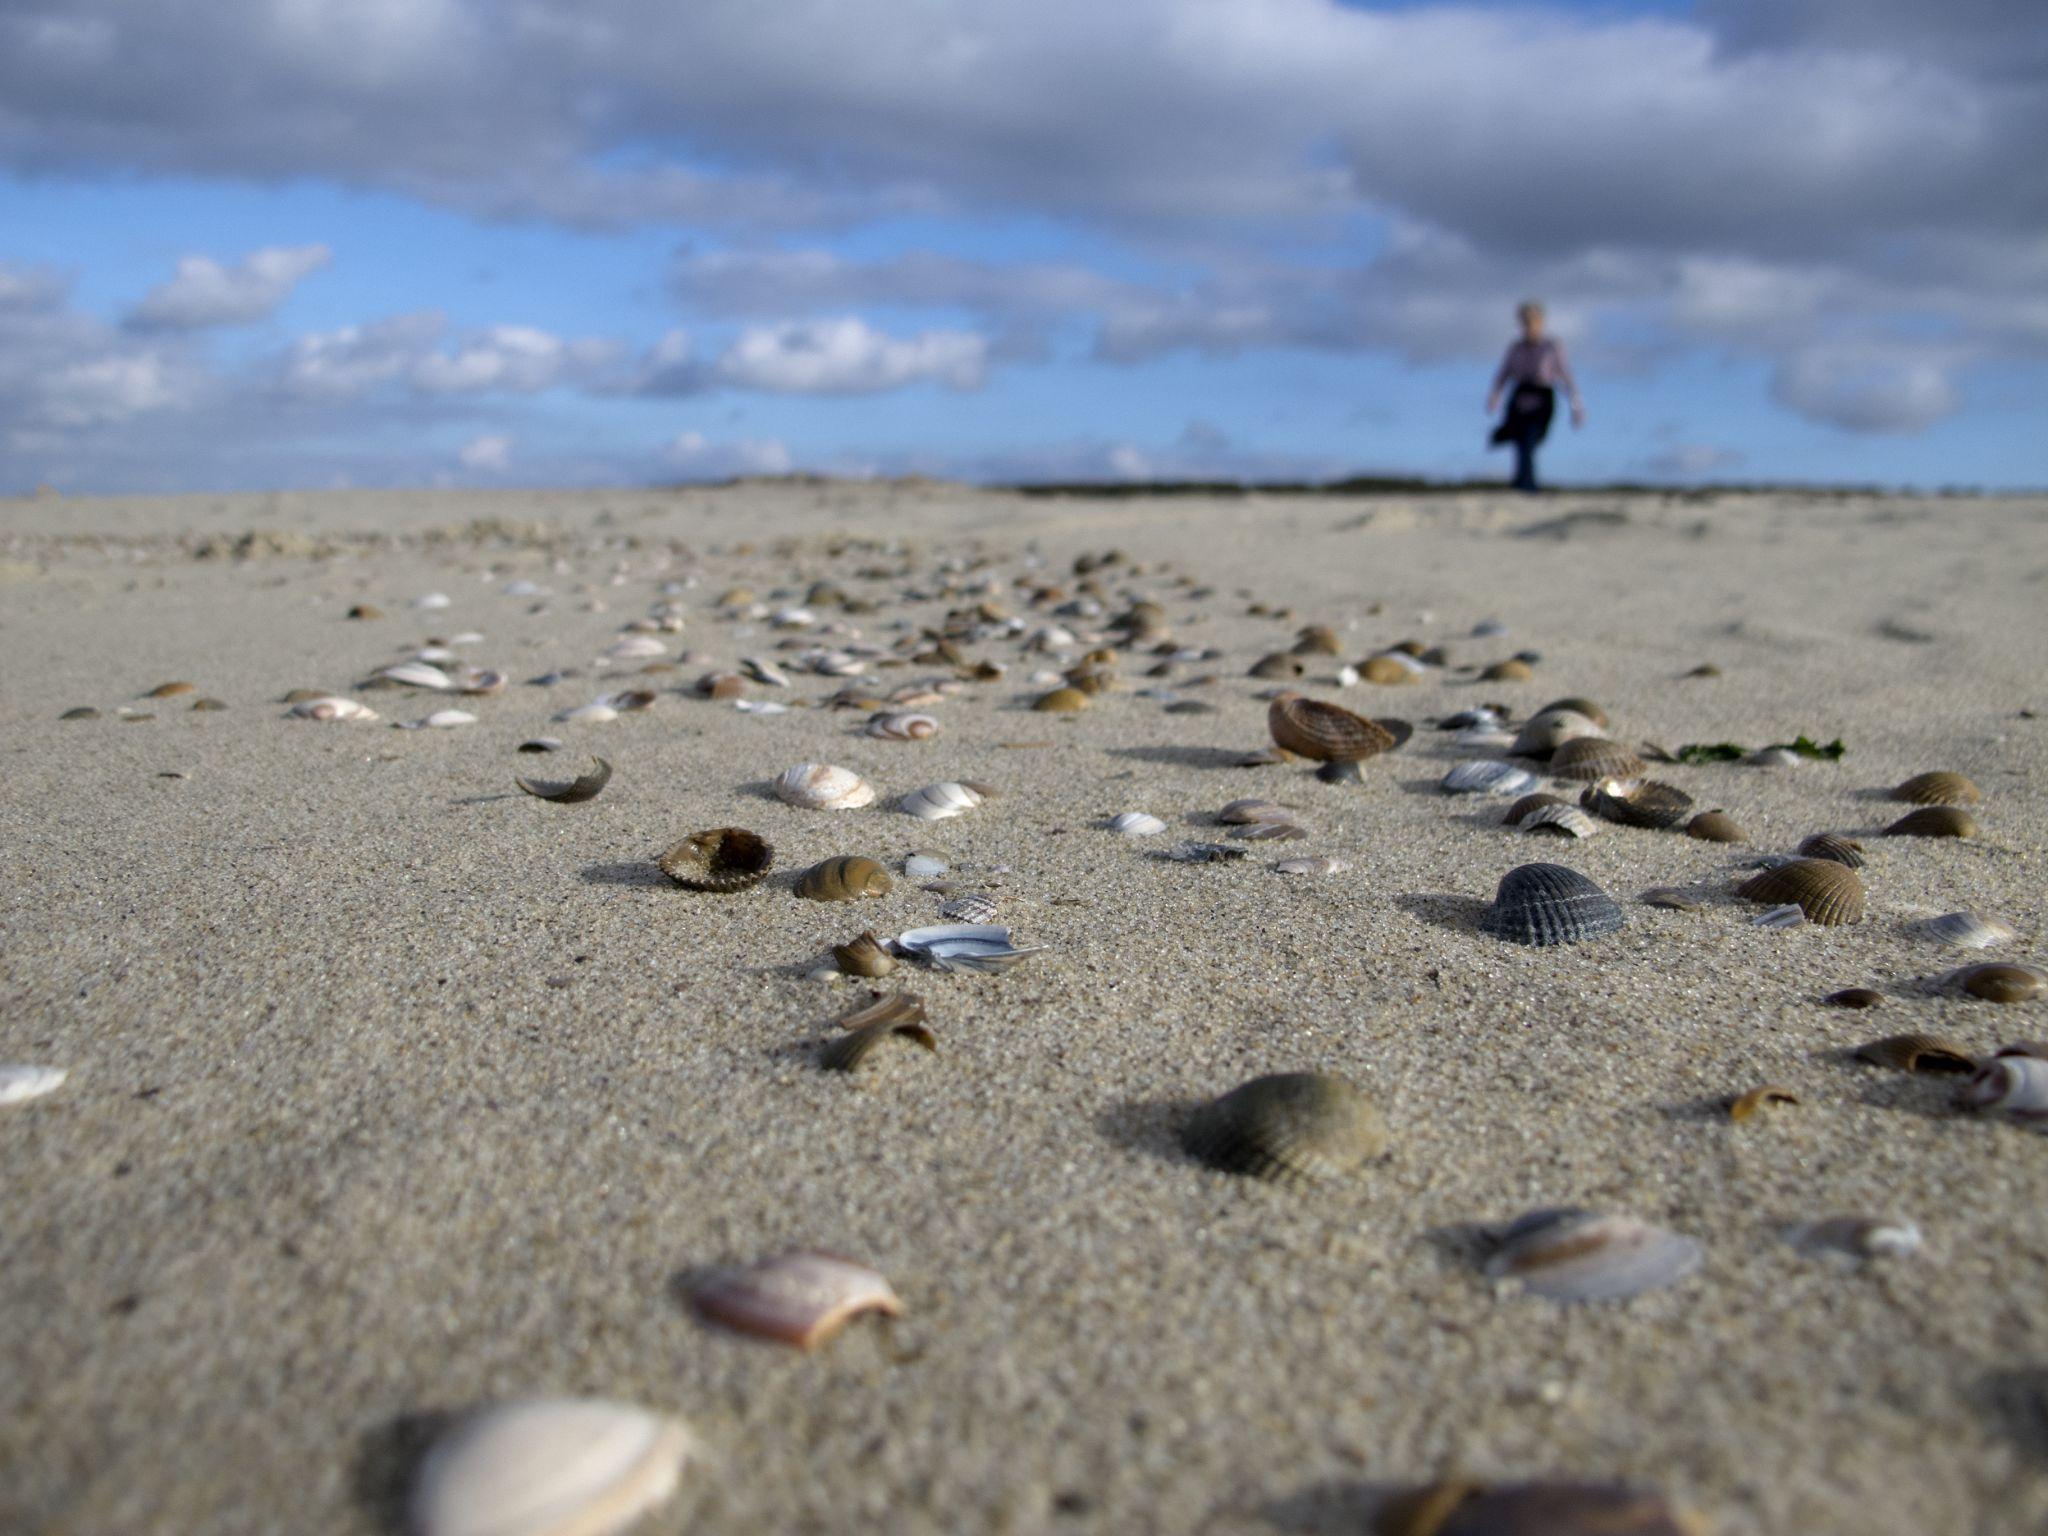 Cadzand beach, Netherlands